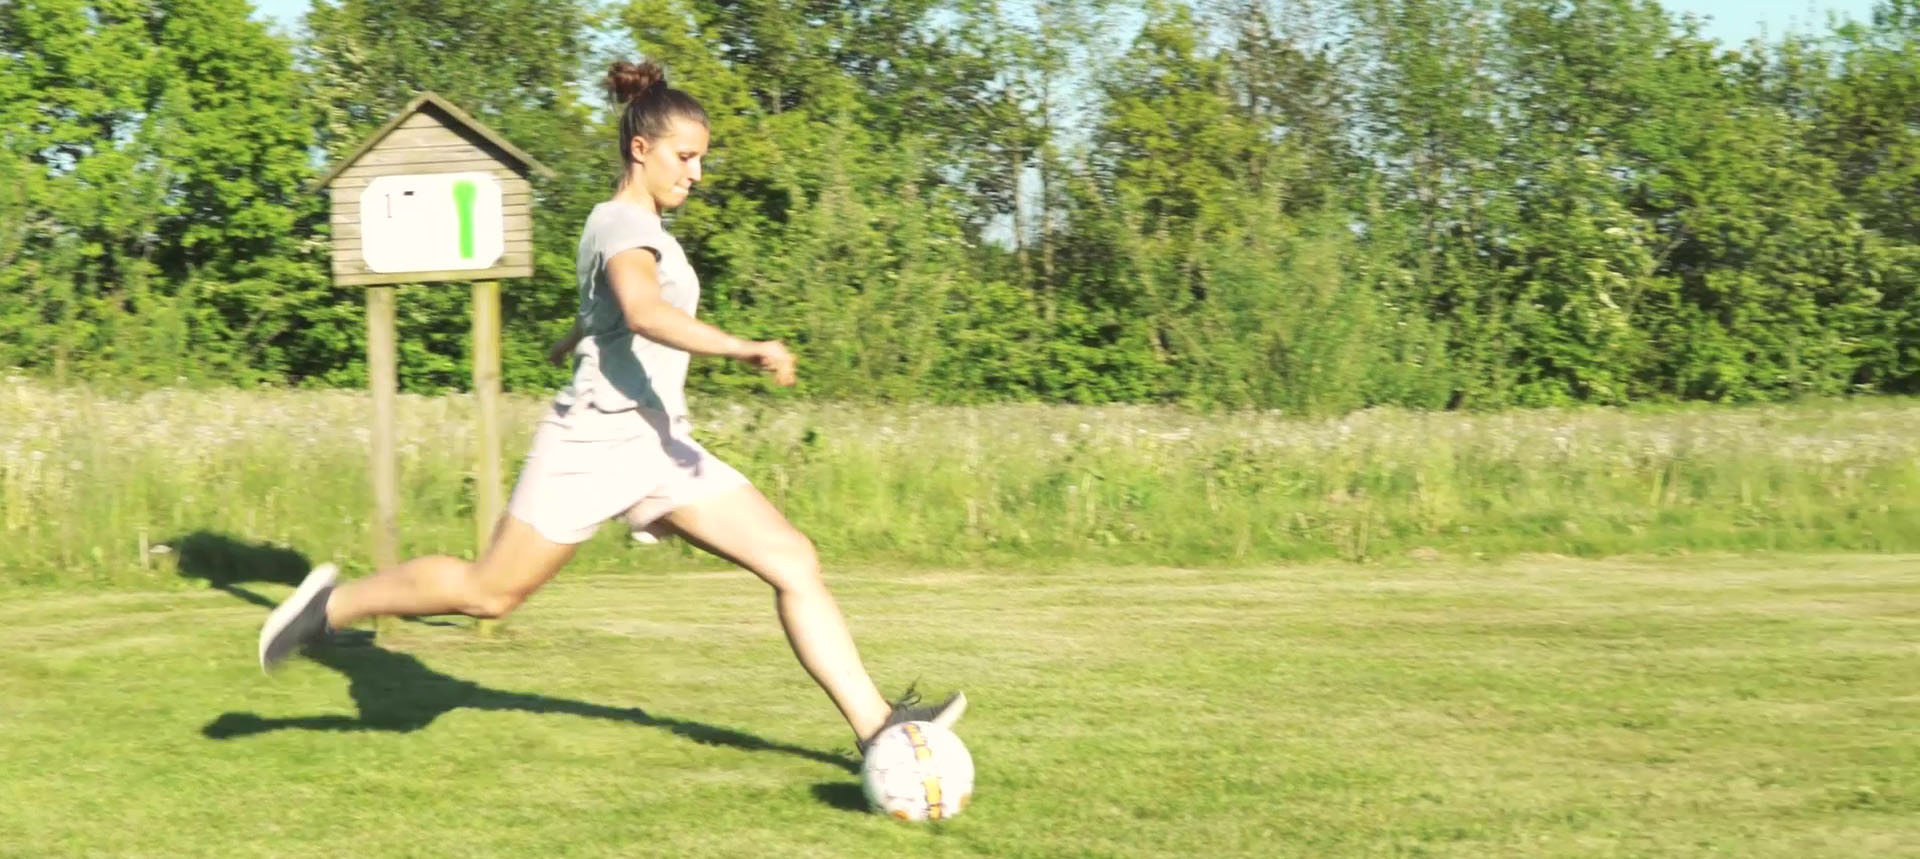 Fodboldgolf_14